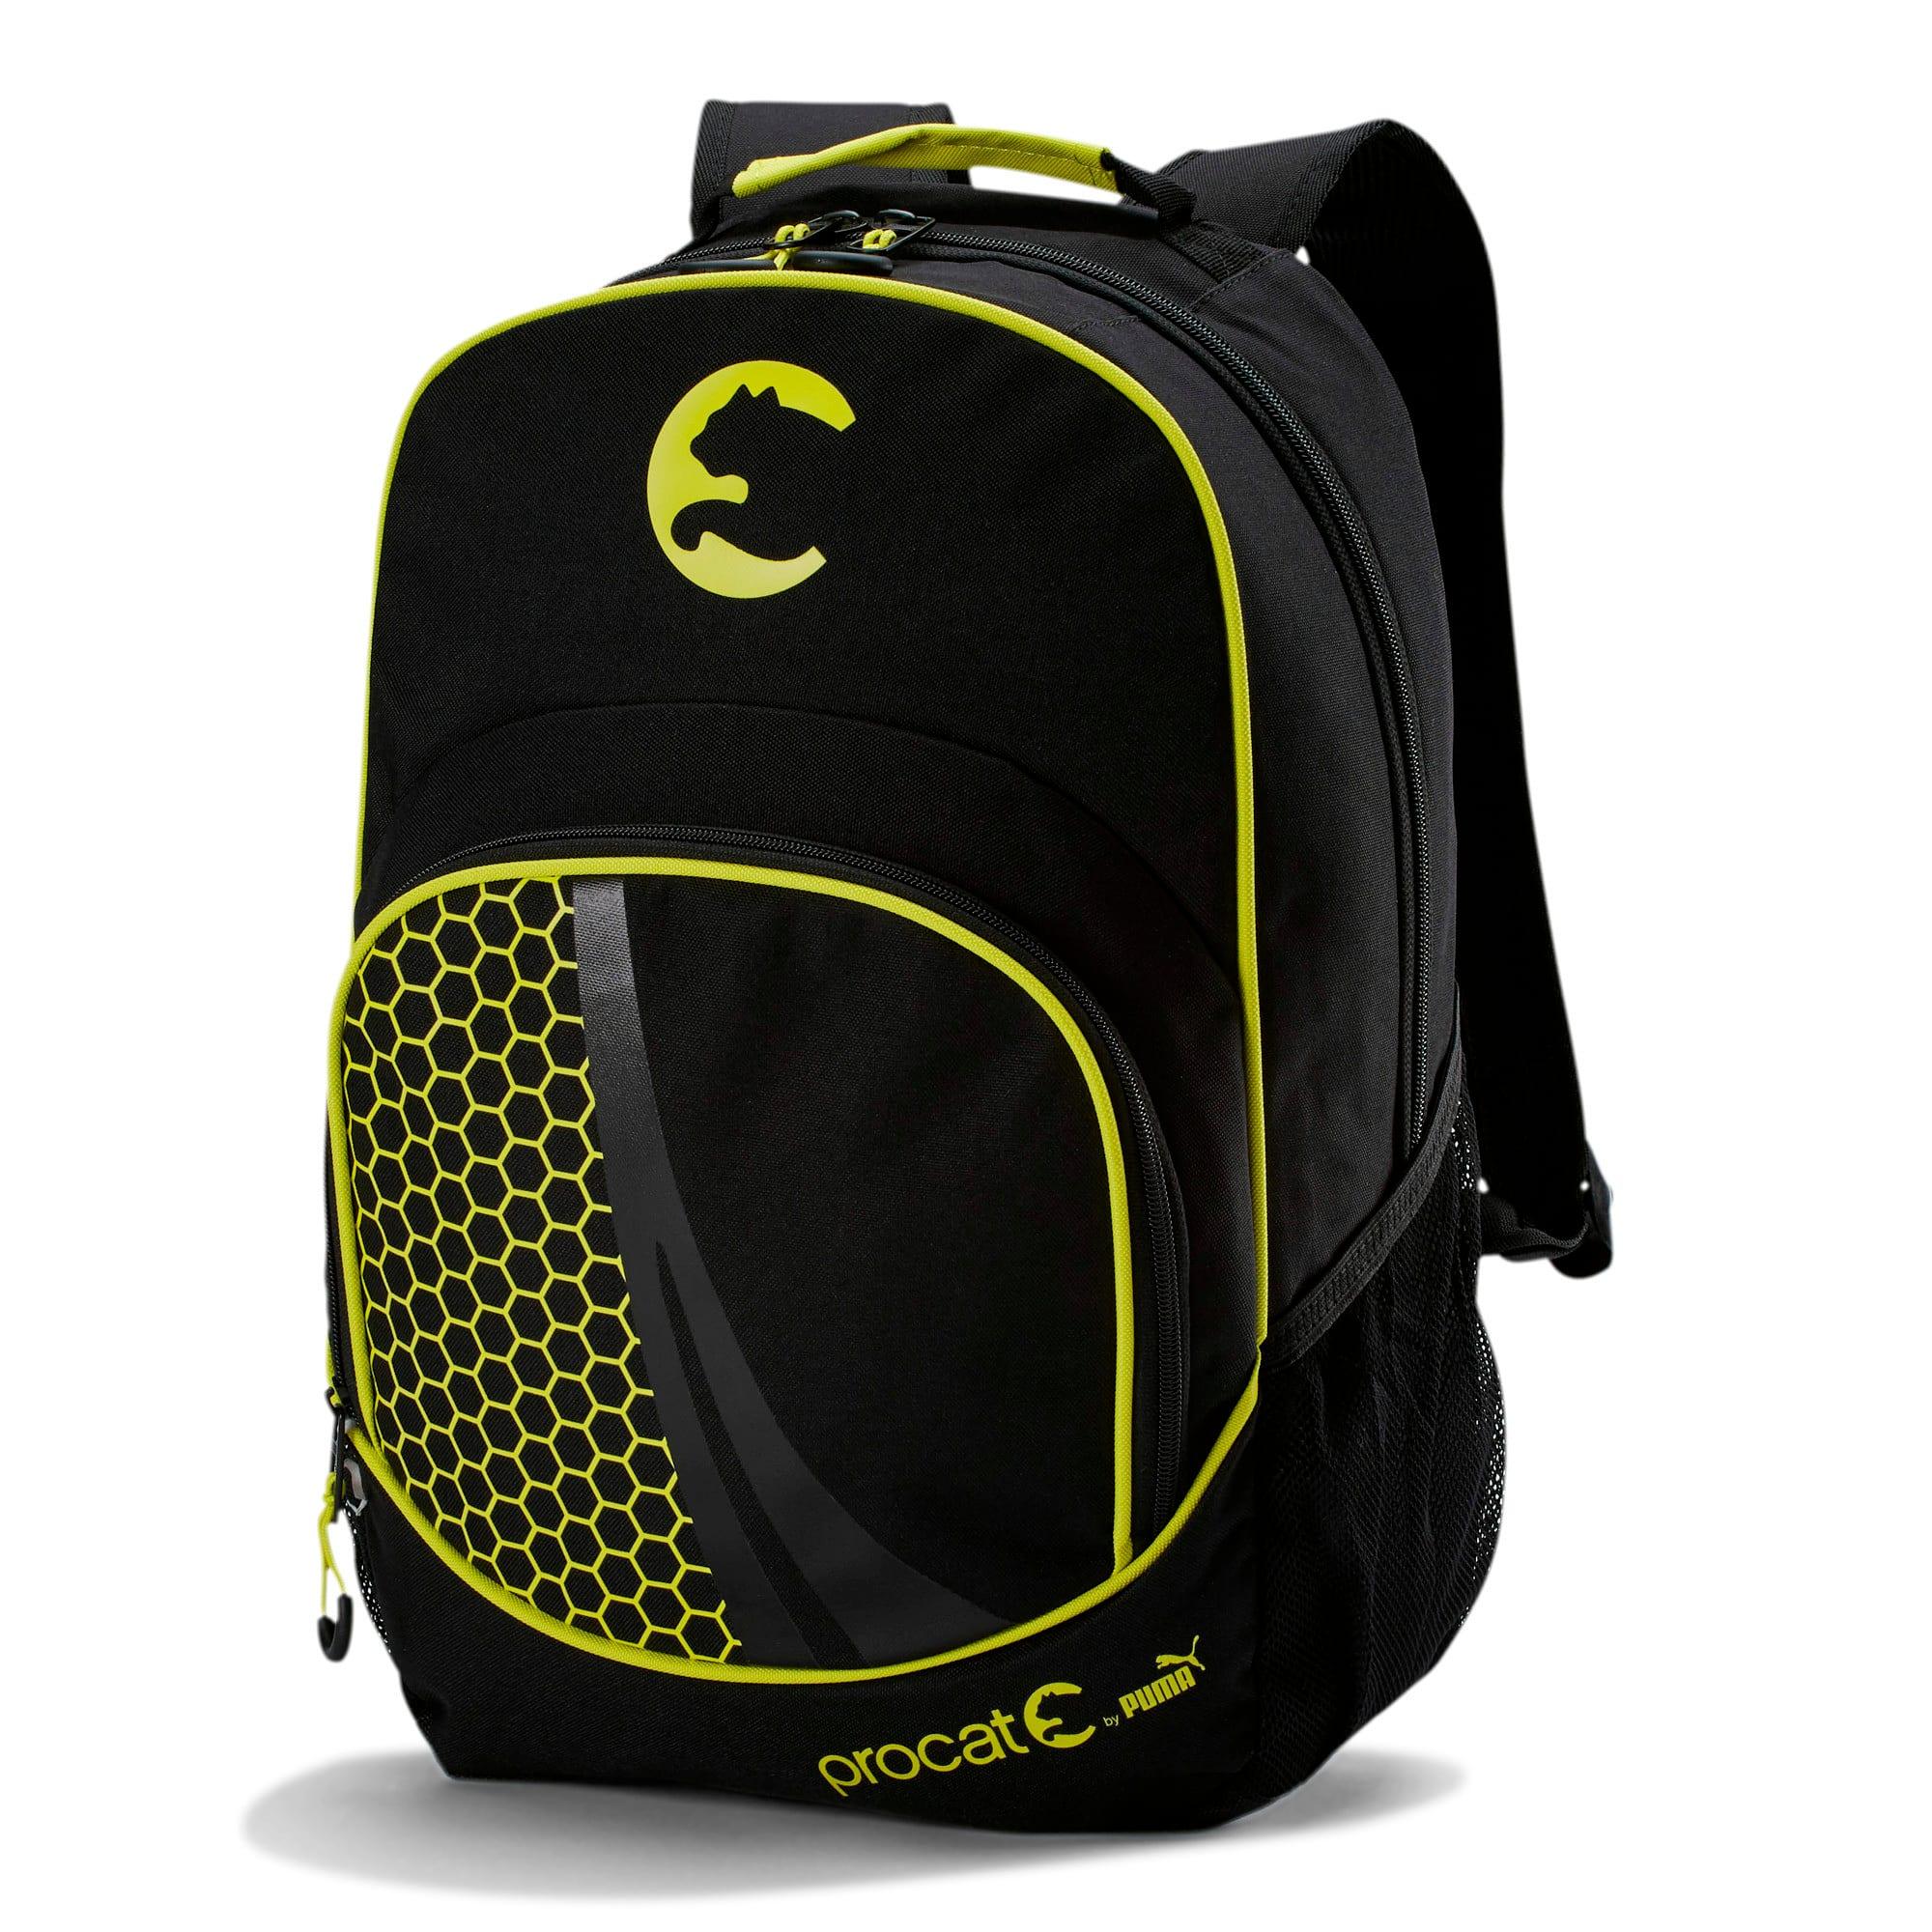 Thumbnail 1 of ProCat Game Day Backpack, BLACK, medium